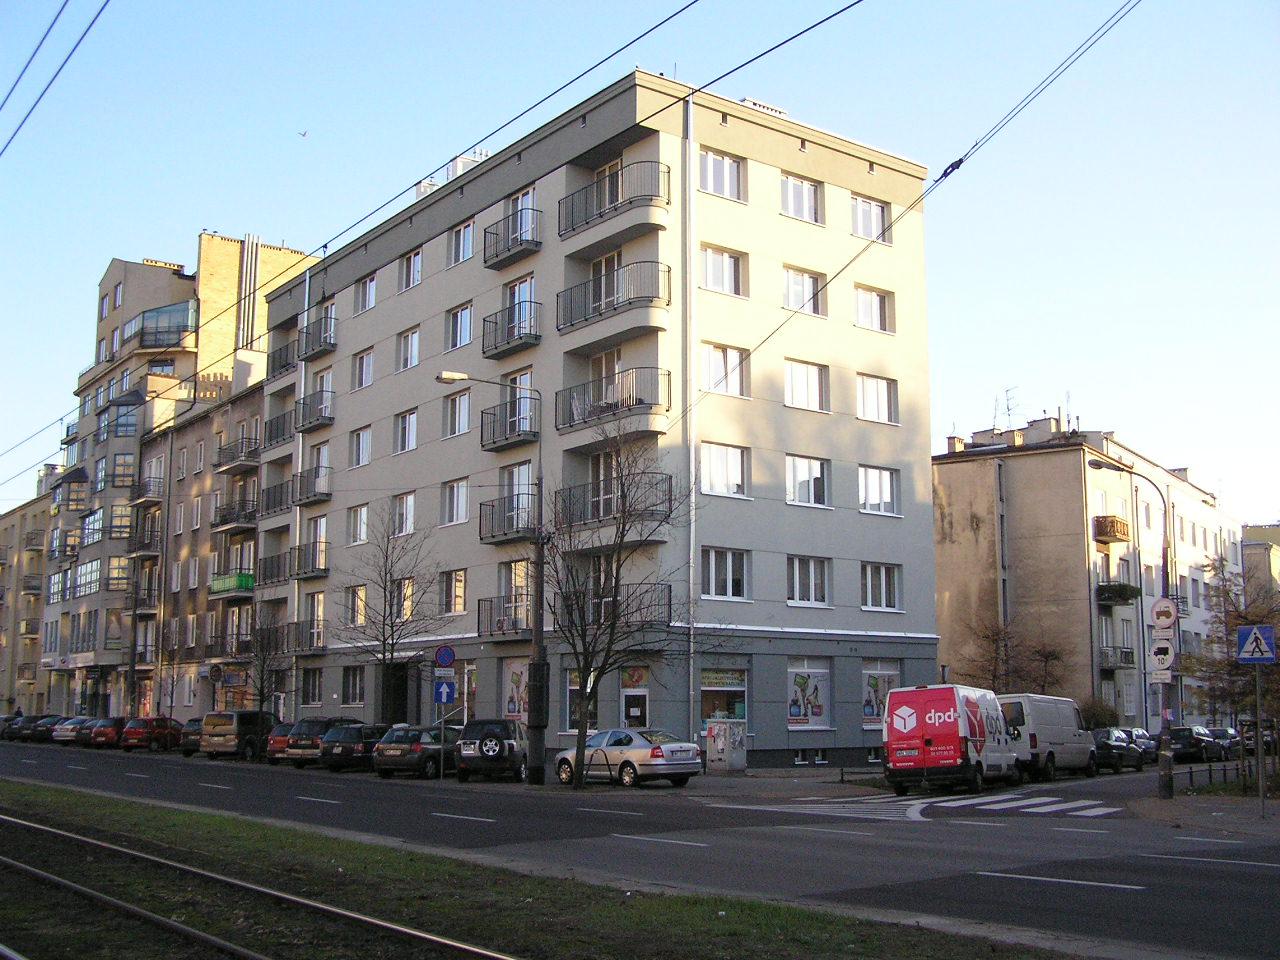 Grochowska 221